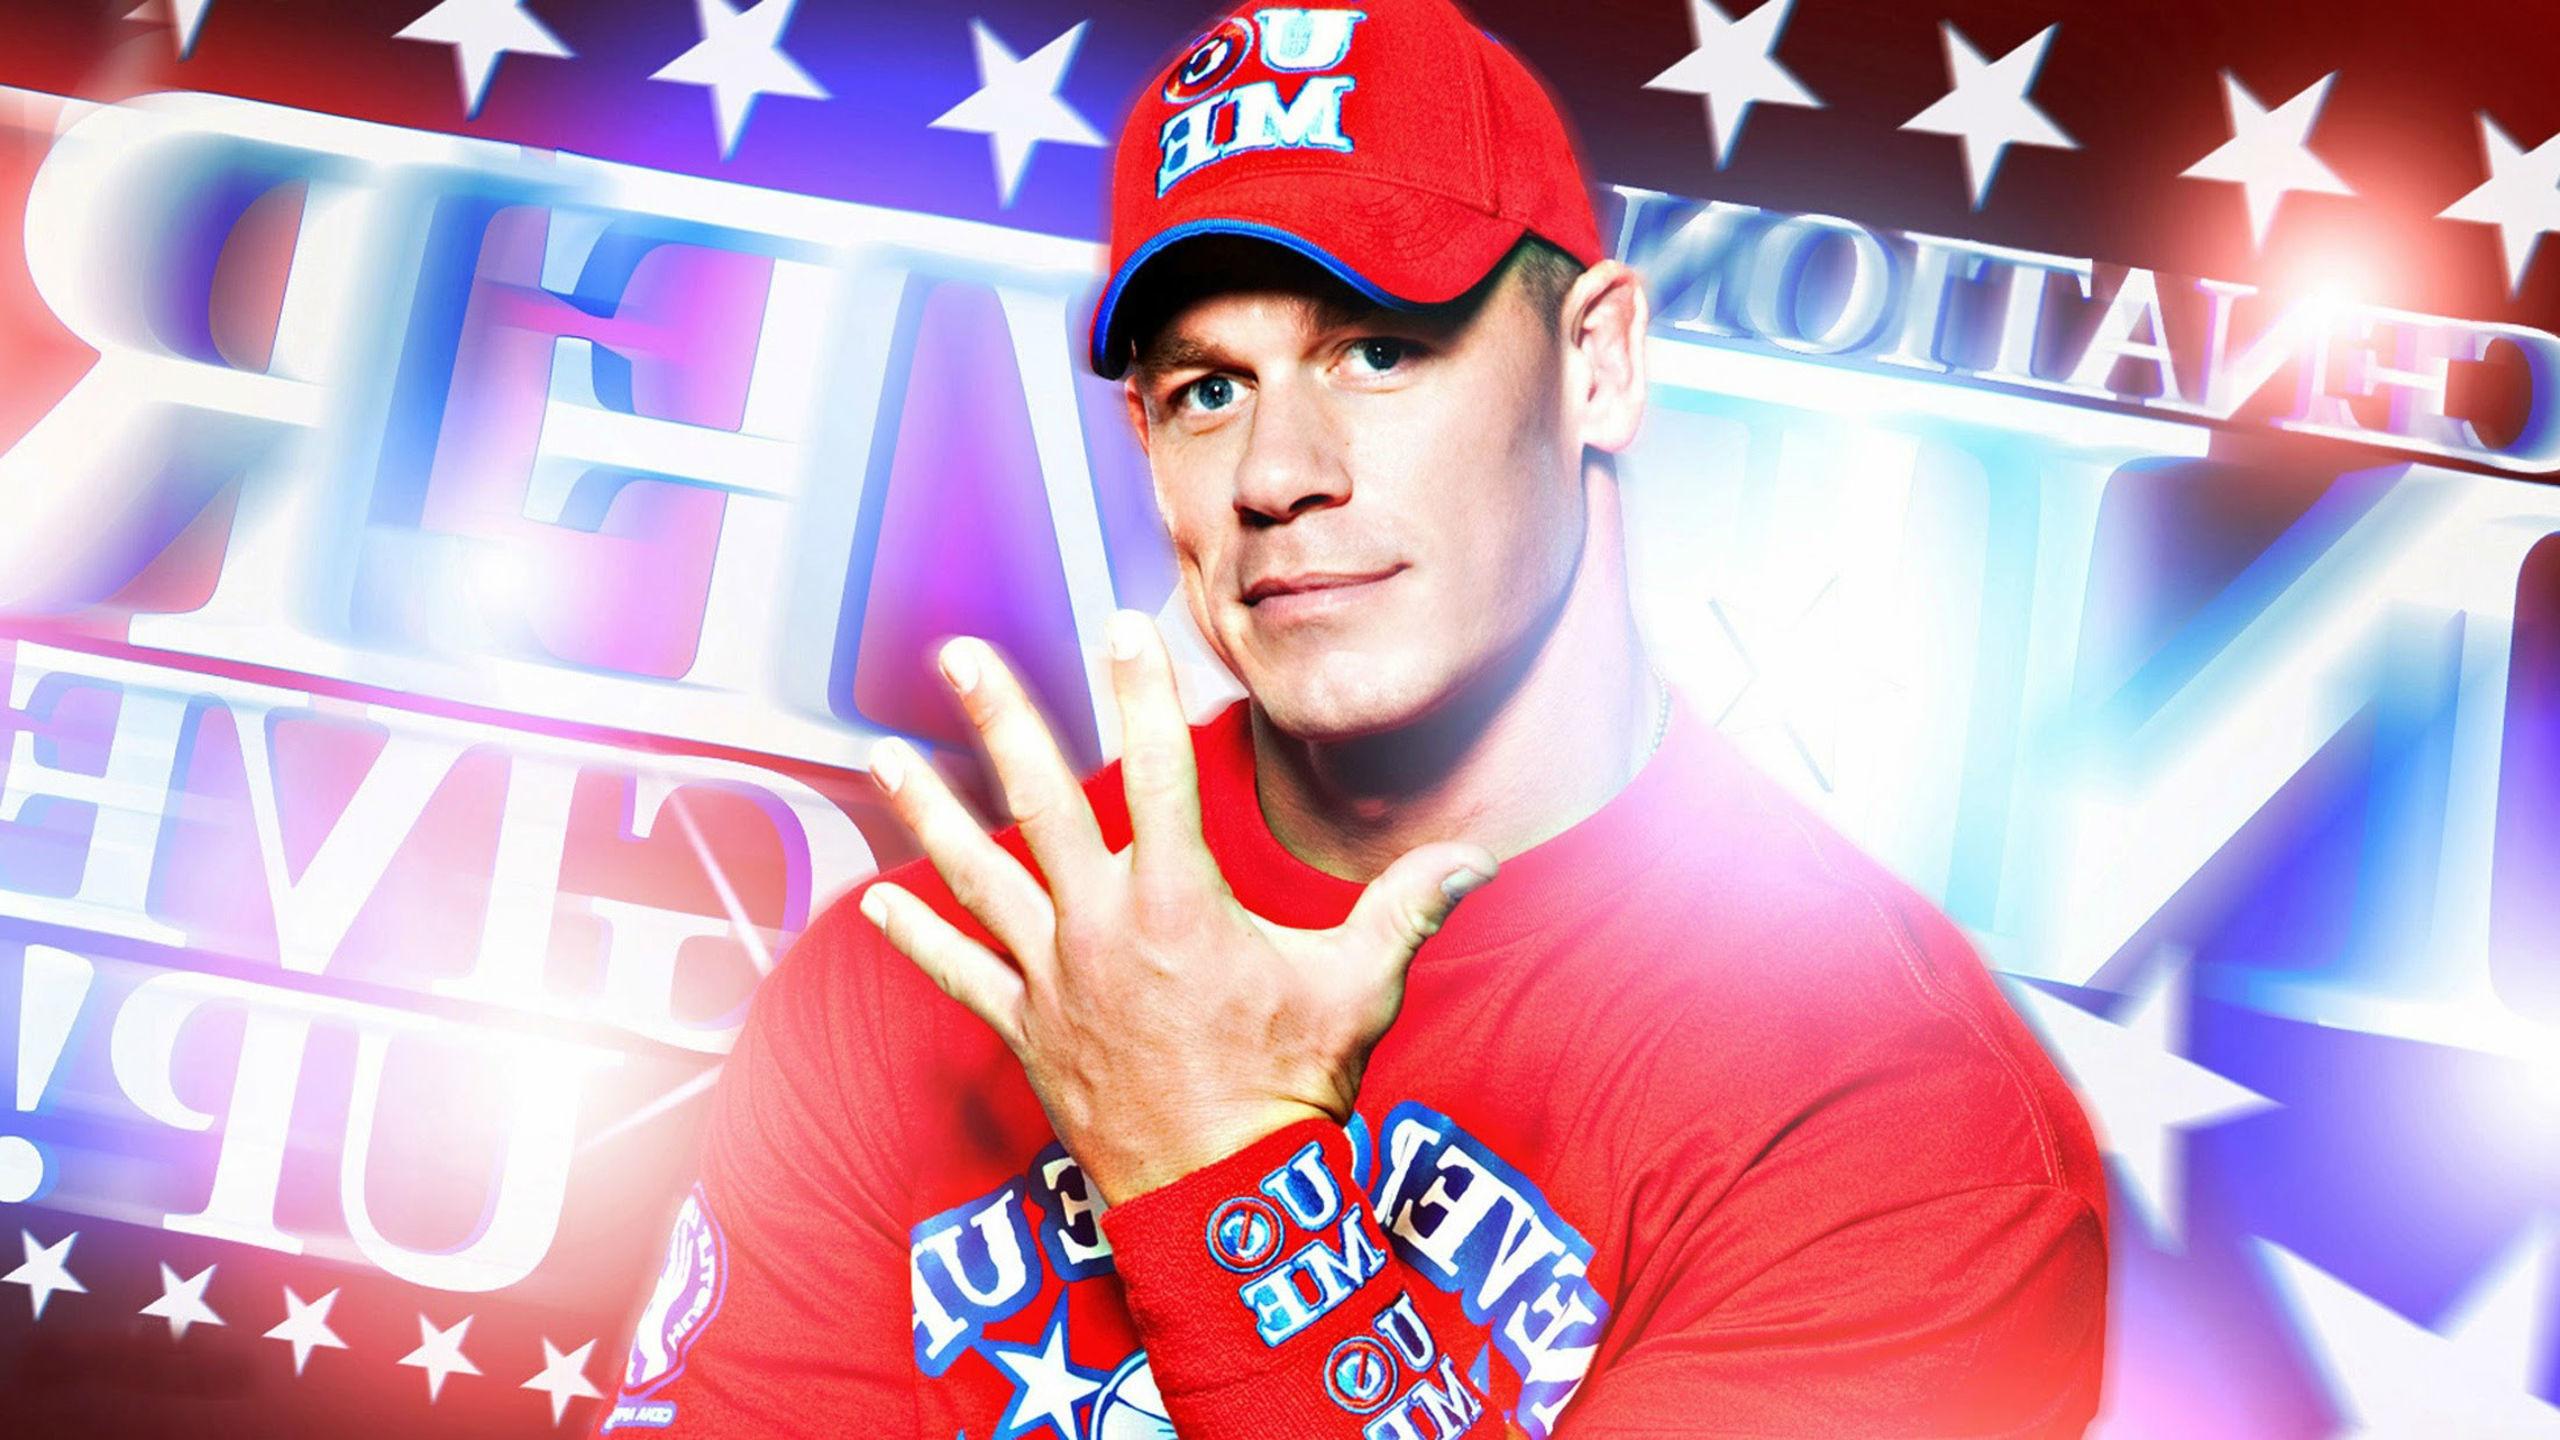 WWE John Cena Wallpaper 2018 HD (53+ images)